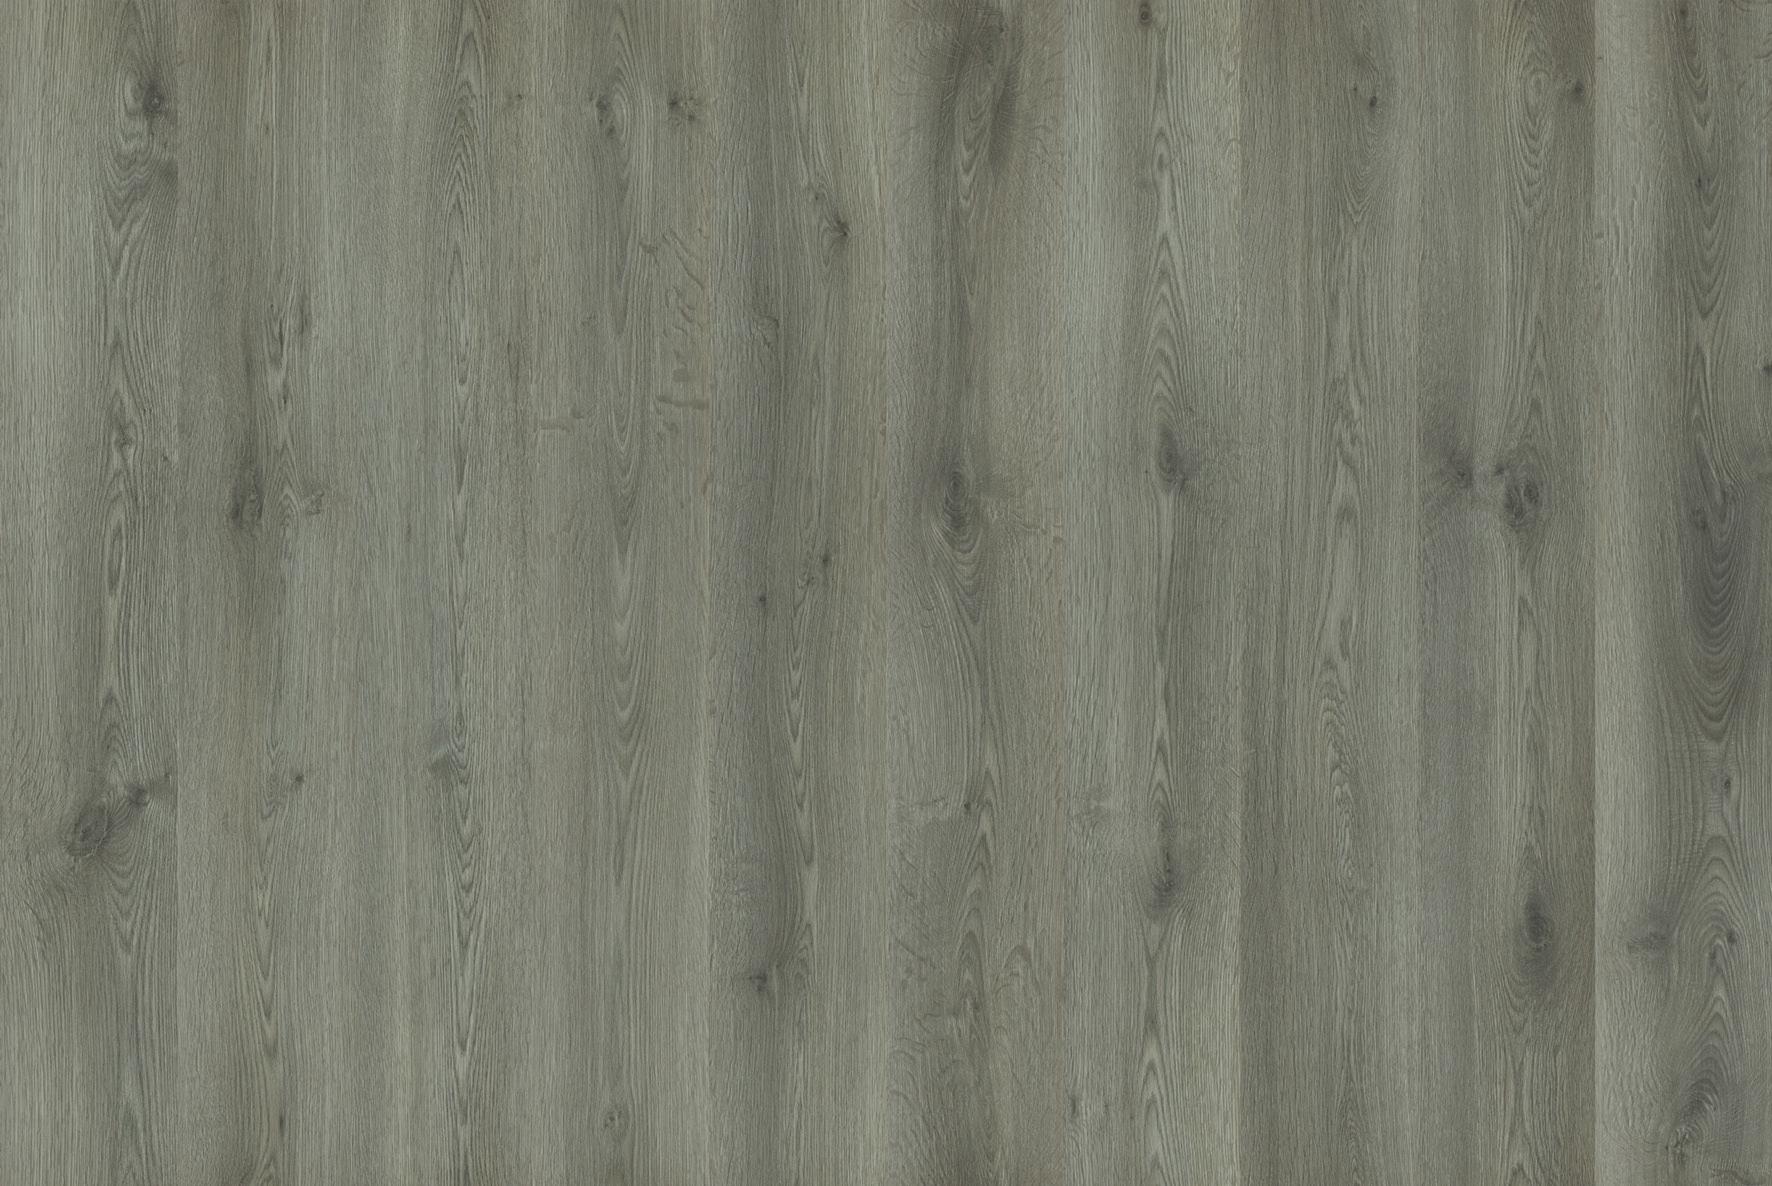 eiche grau 1 stab laminat easy line 832 tarkett deinet. Black Bedroom Furniture Sets. Home Design Ideas